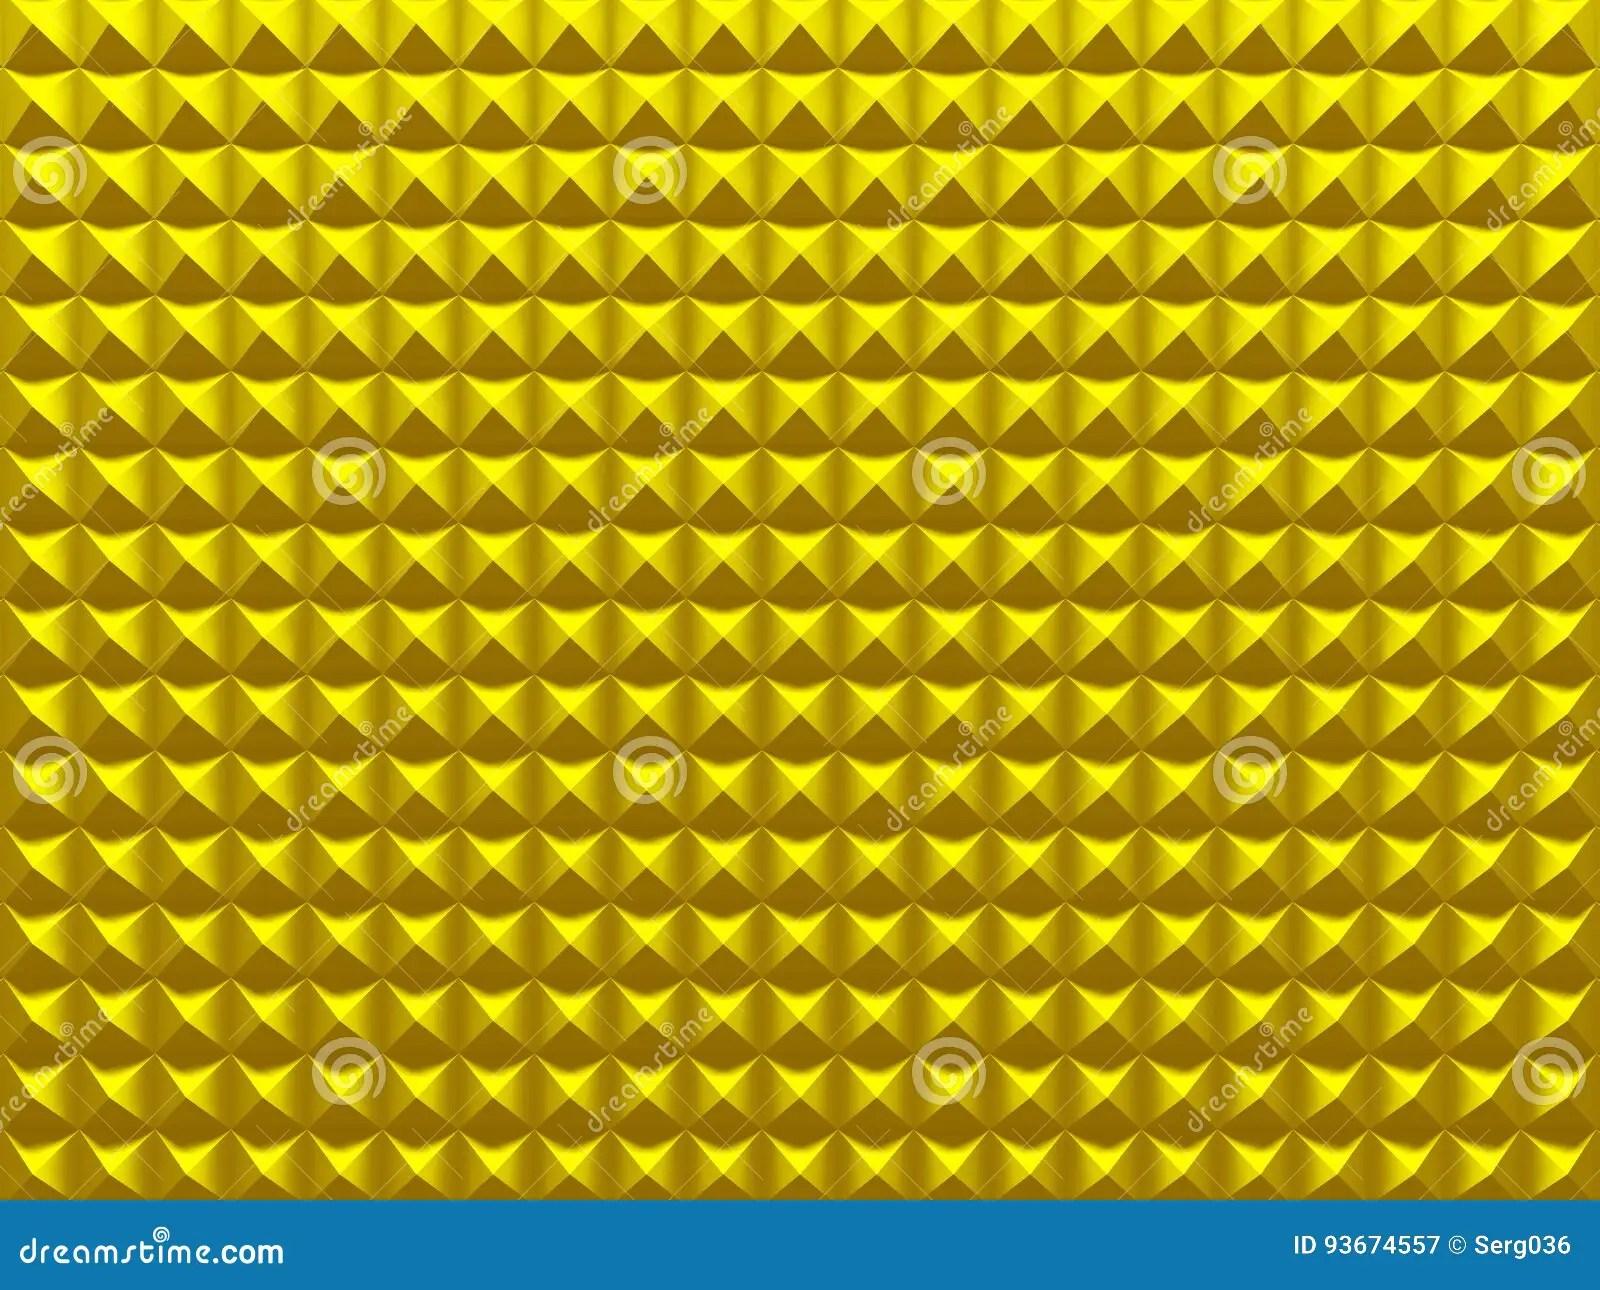 Pyramids. Yellow Geometric Background Texture Stock